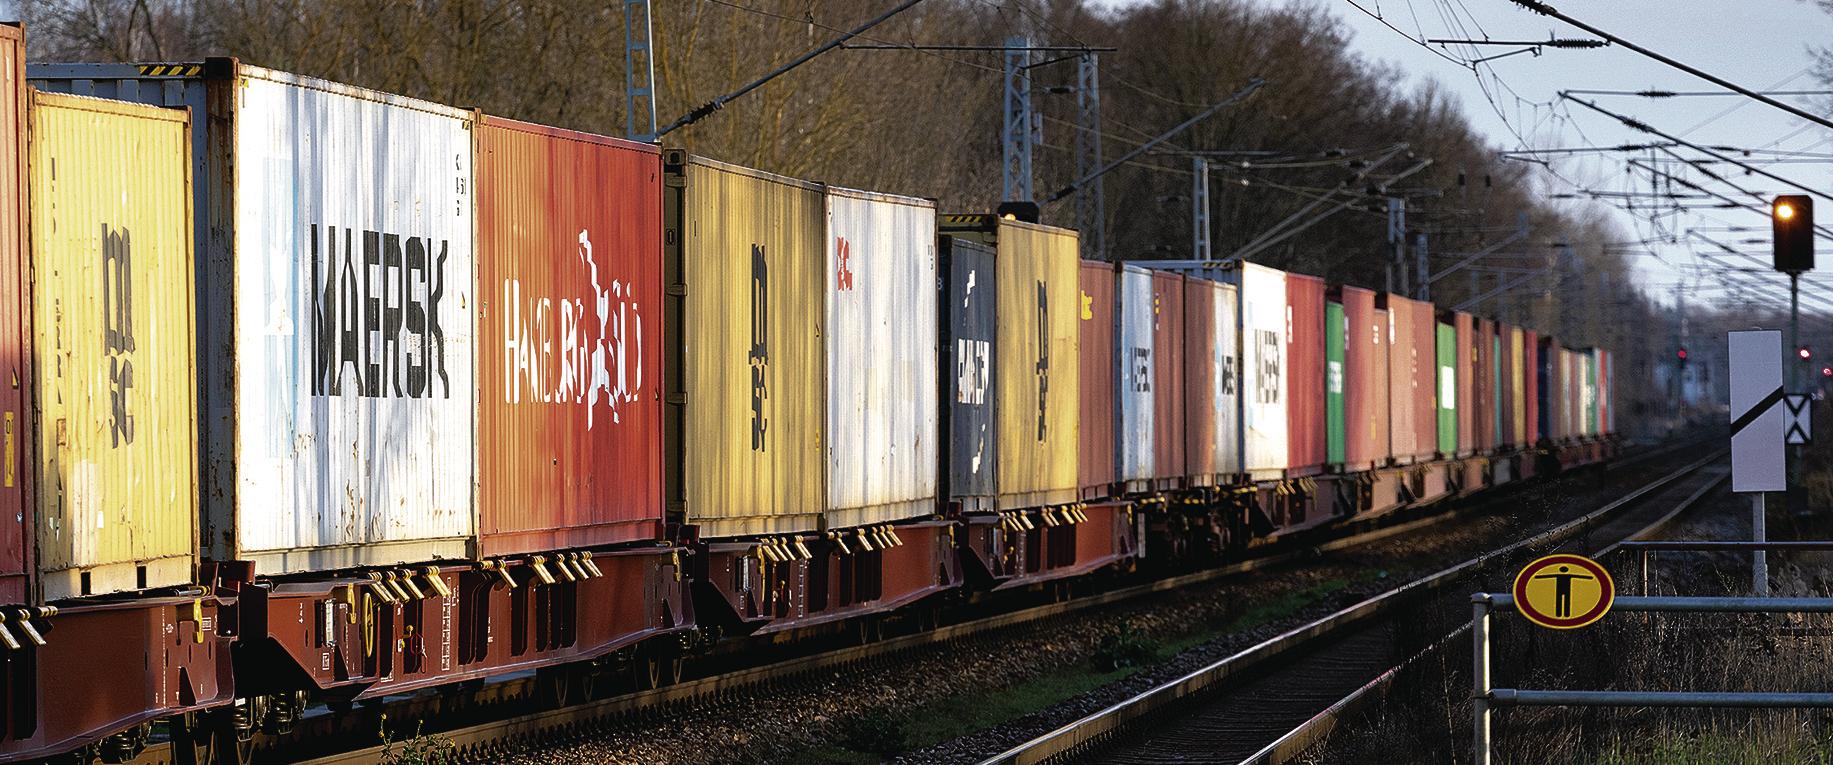 Bahnstrecke Mannheim Karlsruhe